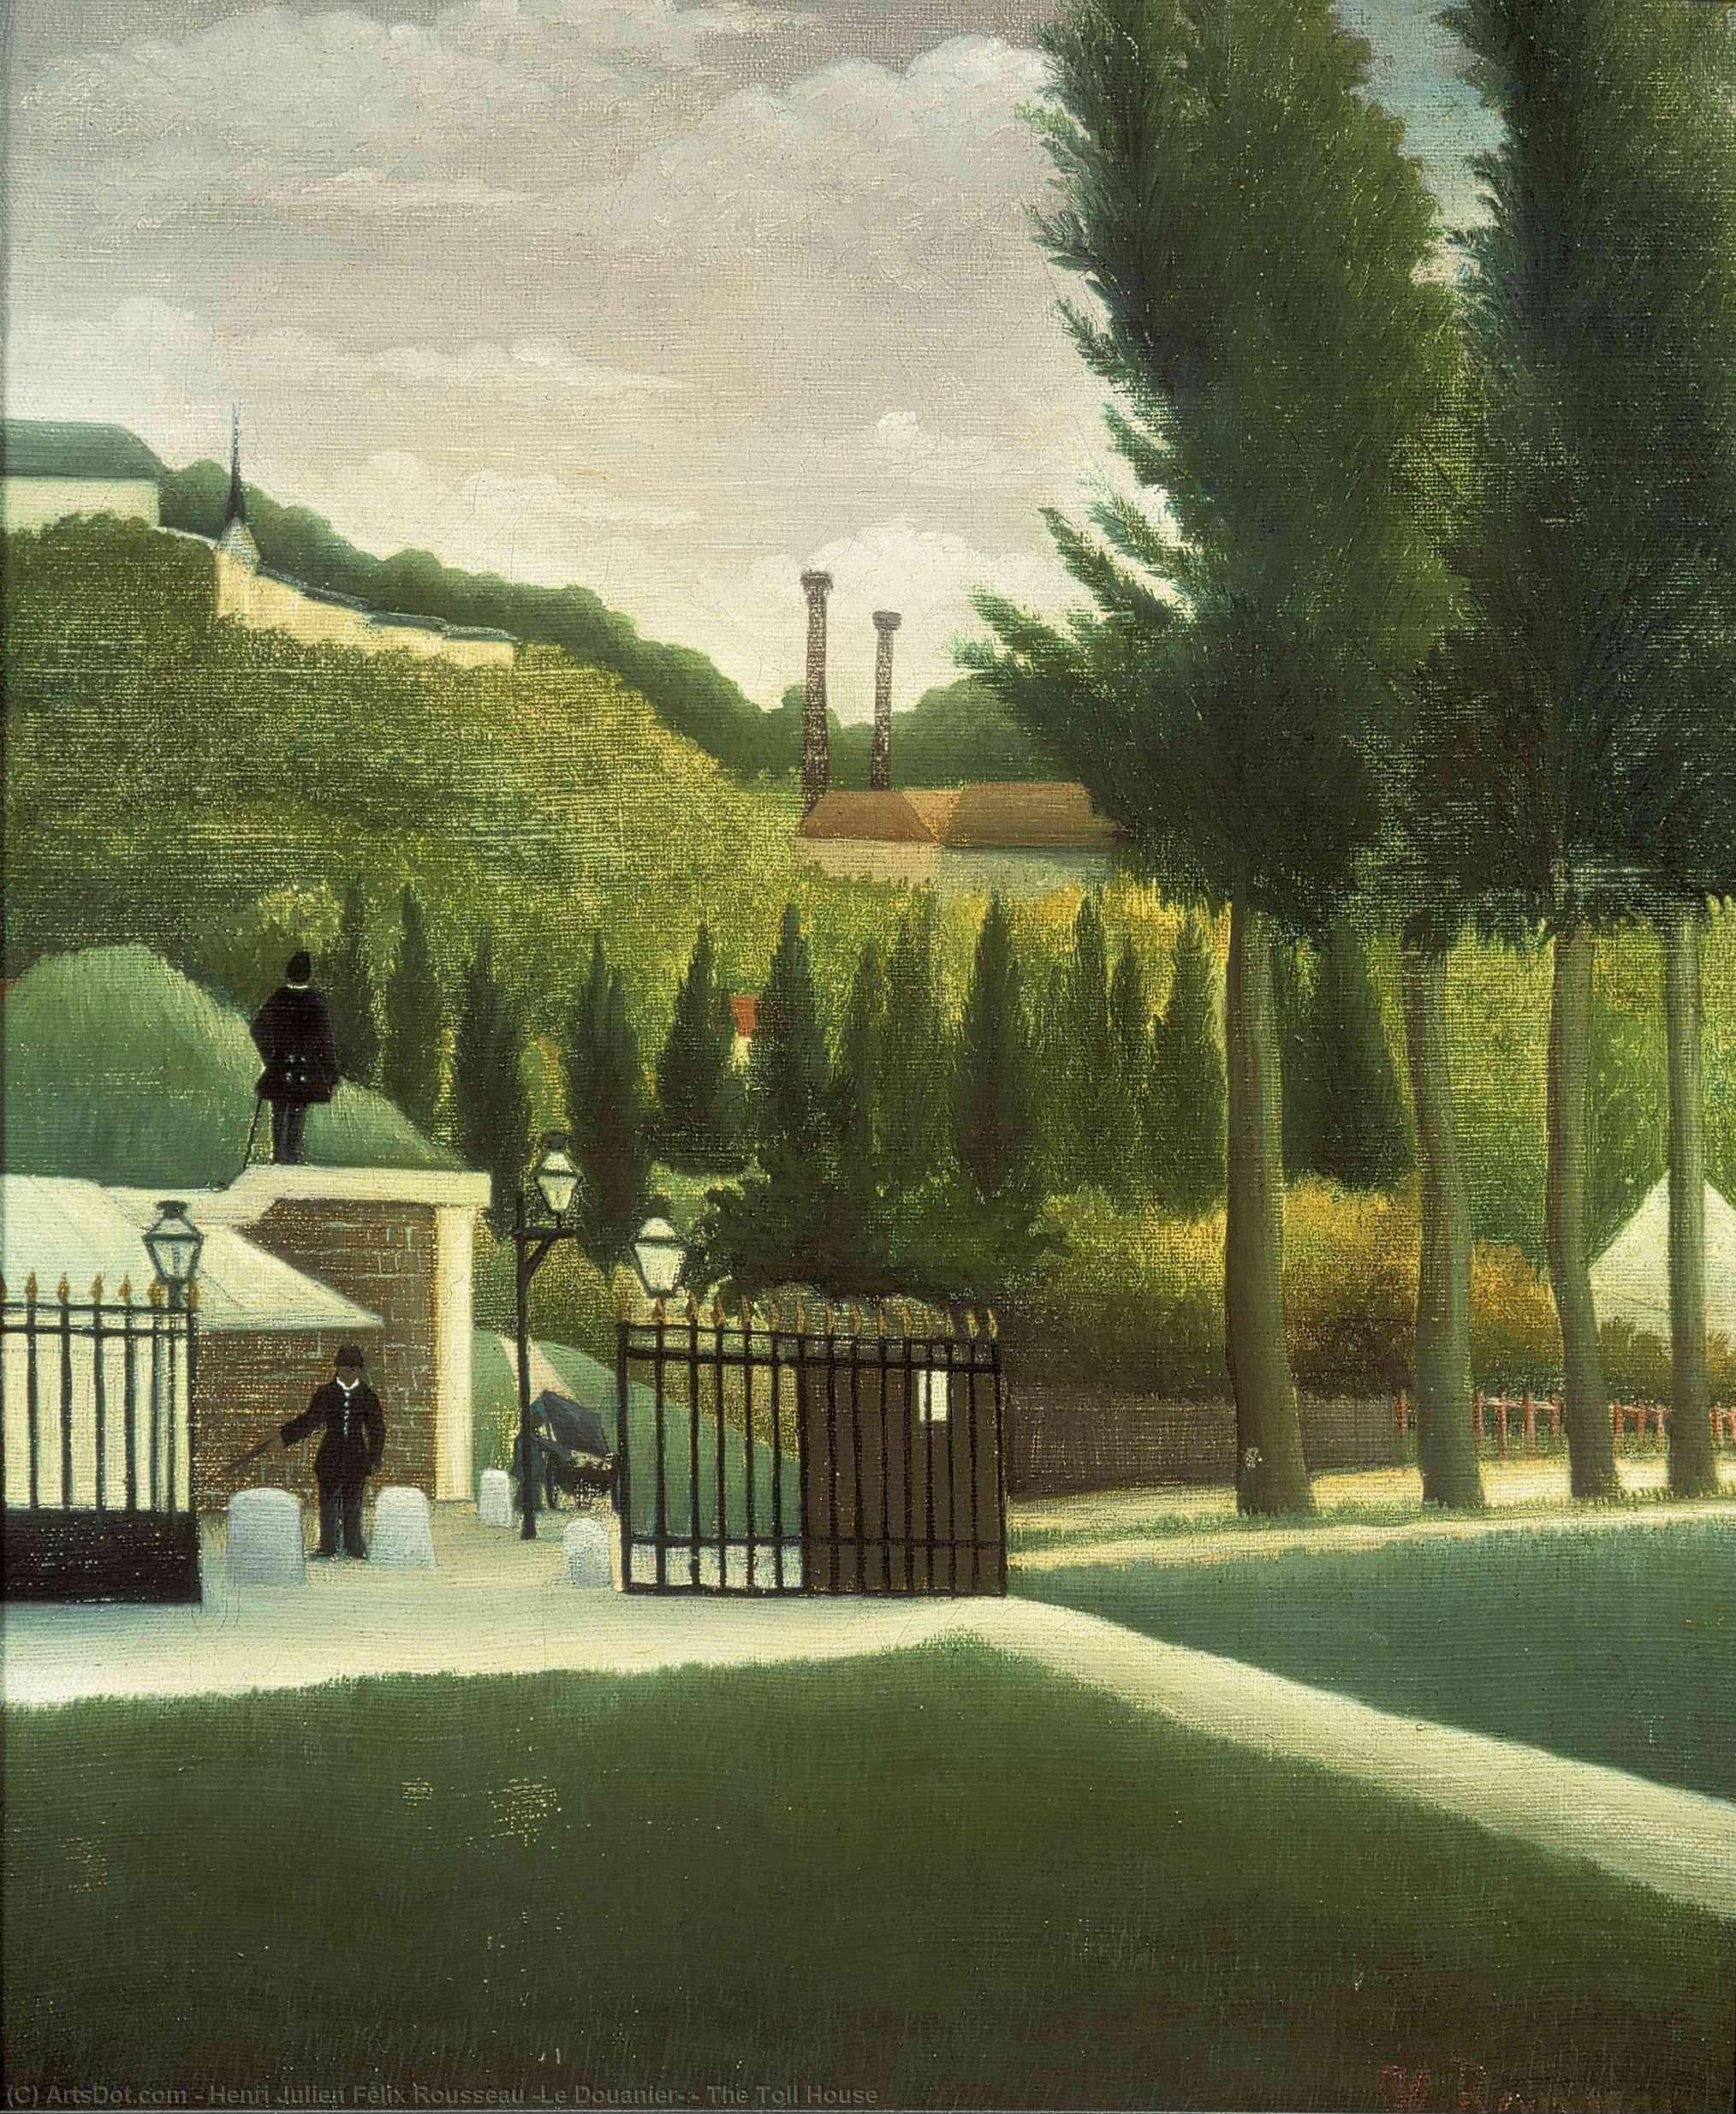 Wikioo.org - The Encyclopedia of Fine Arts - Painting, Artwork by Henri Julien Félix Rousseau (Le Douanier) - The Toll House